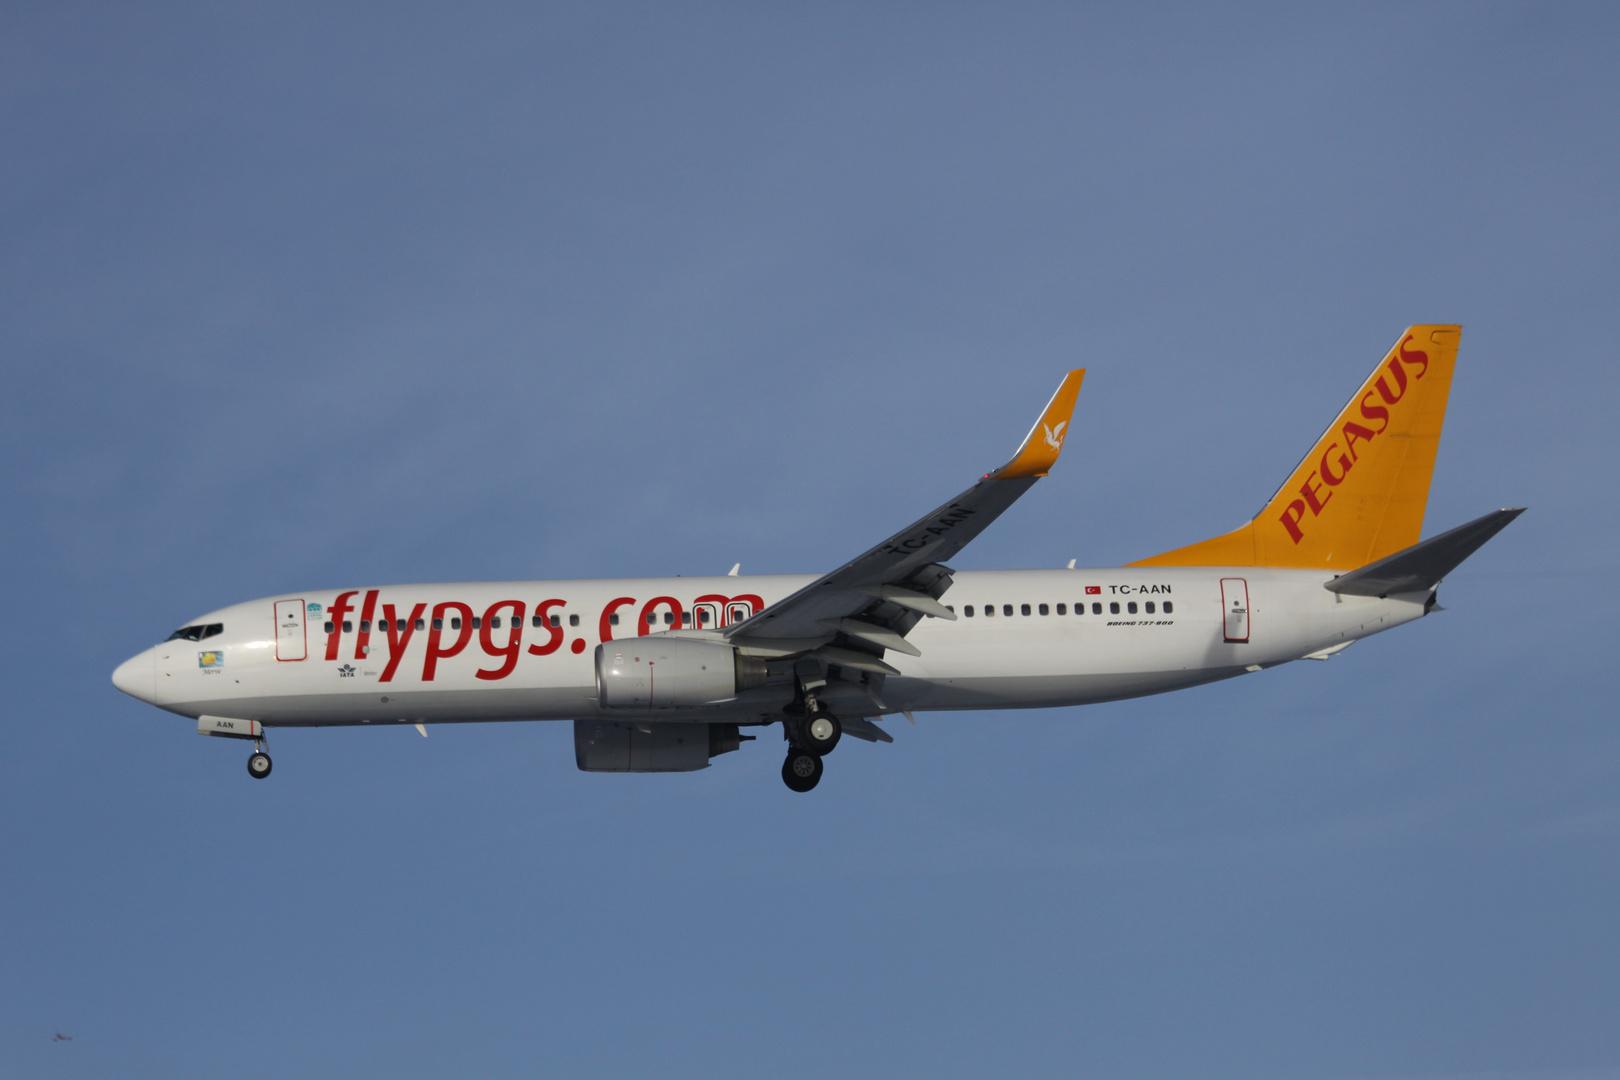 flypgs.com